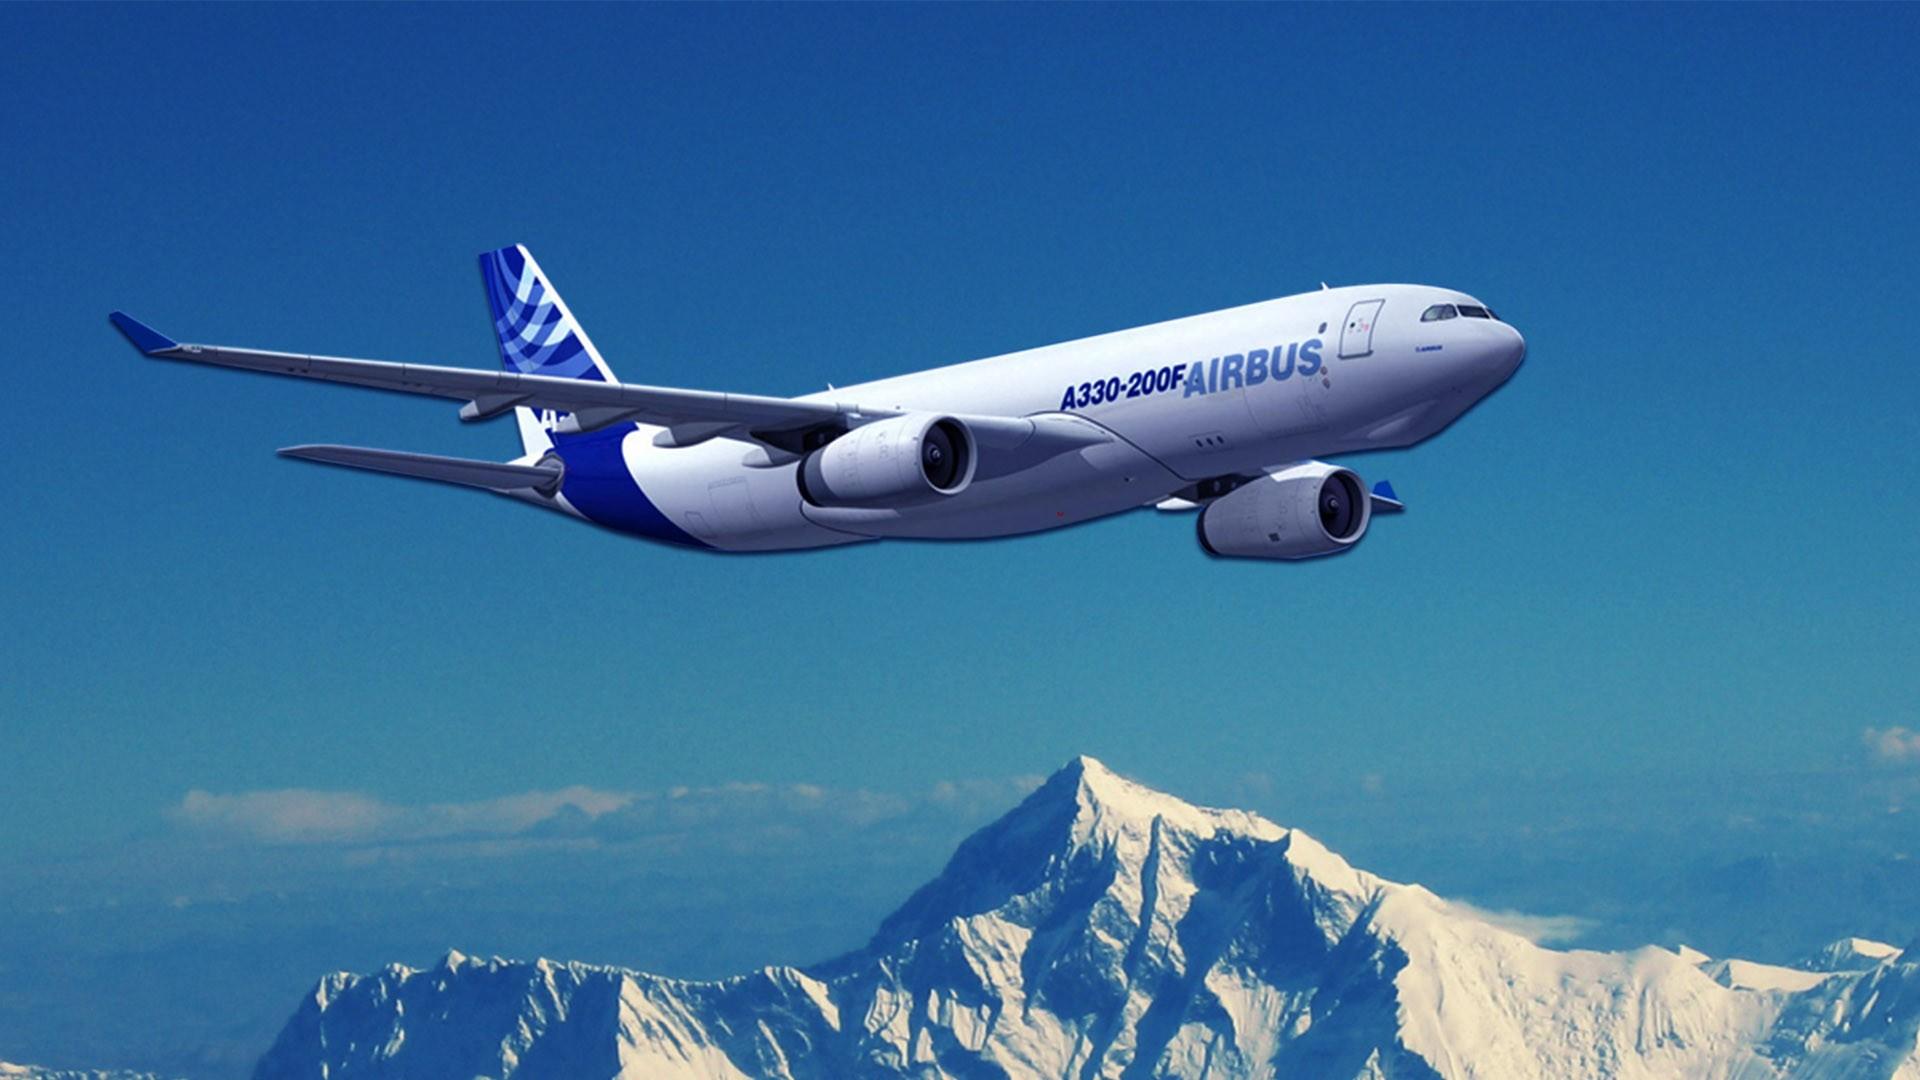 Airbus Background Wallpaper 34380   Baltana 1920x1080